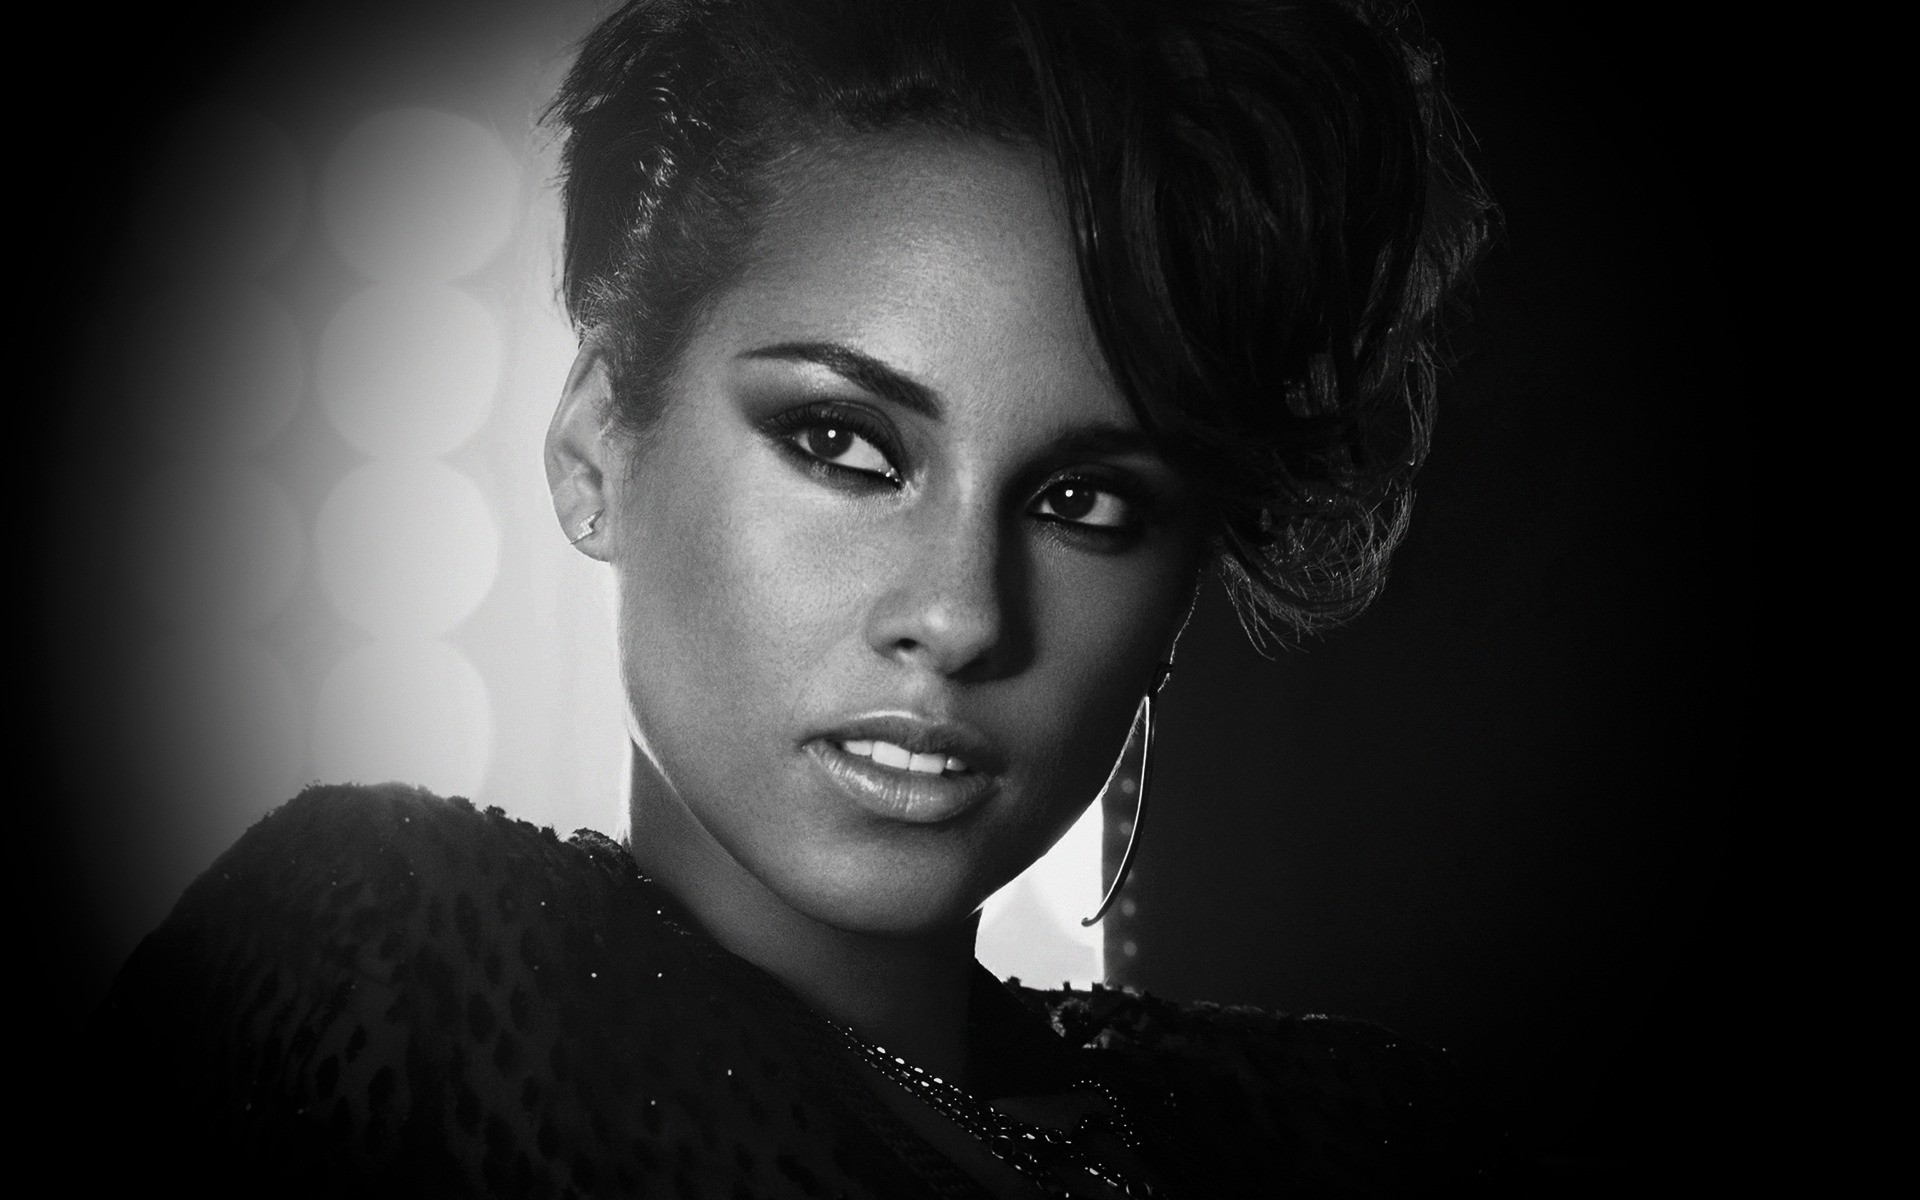 Music Portrait Fashion Monochrome Woman Model Dark - Alicia Keys Quotes About Love - HD Wallpaper